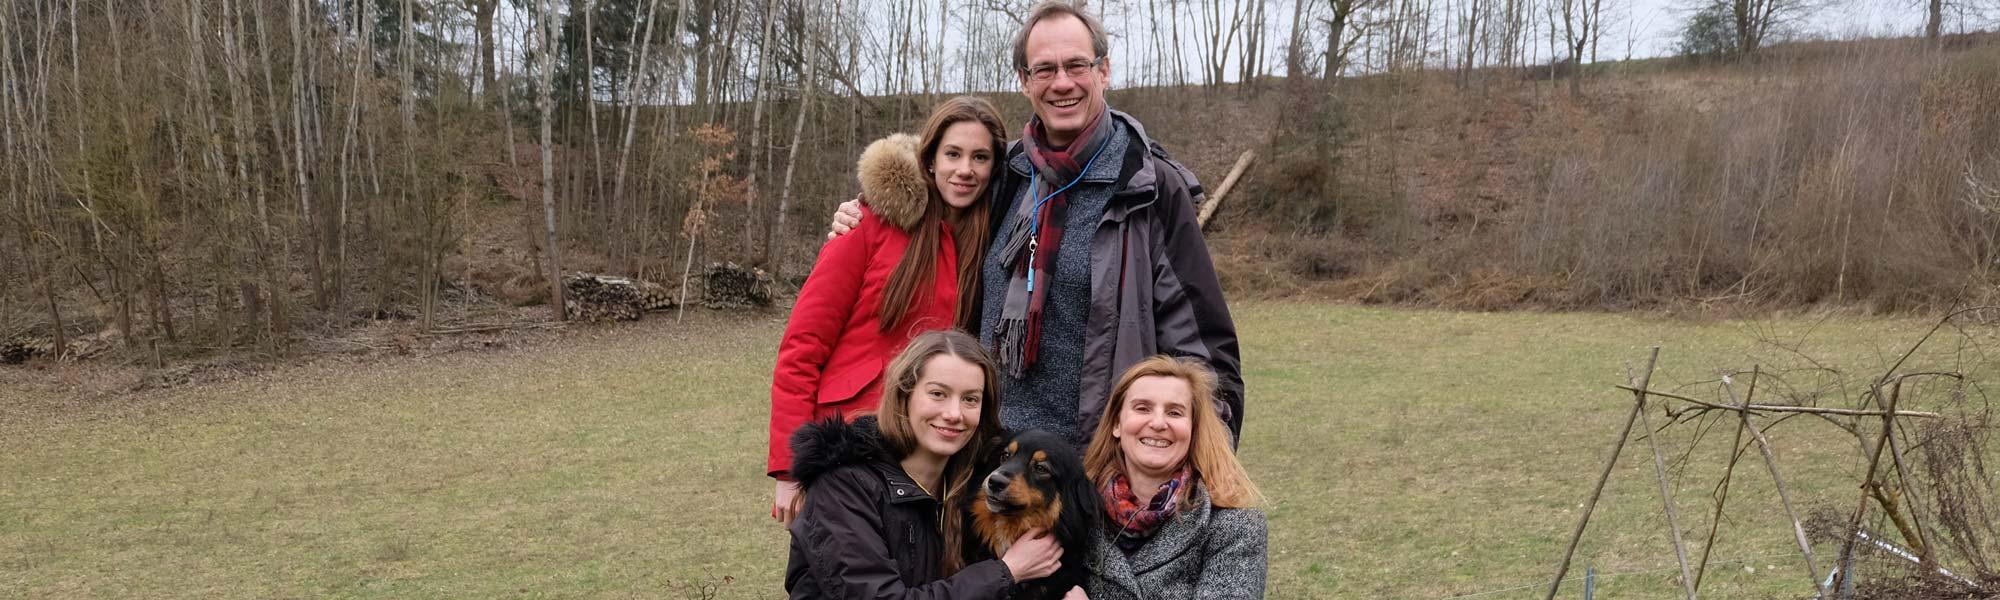 Familie Hieber mit Australian Sheperd Rüde Samson